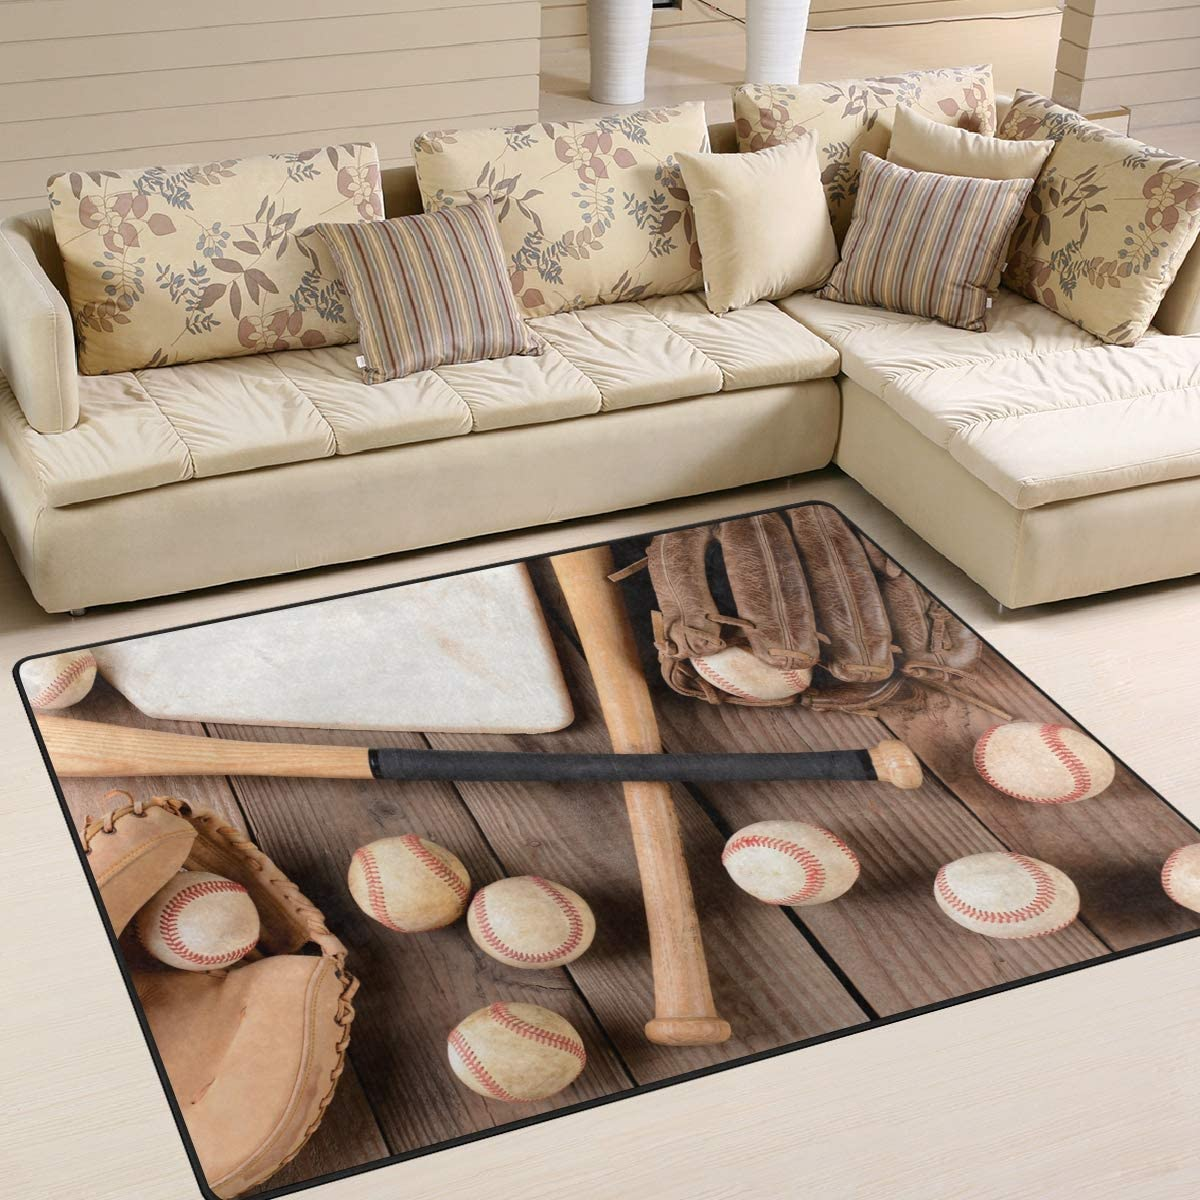 ALAZA Vintage Baseball on Wooden Sport Area Rug Rugs for Living Room Bedroom 7 x 5